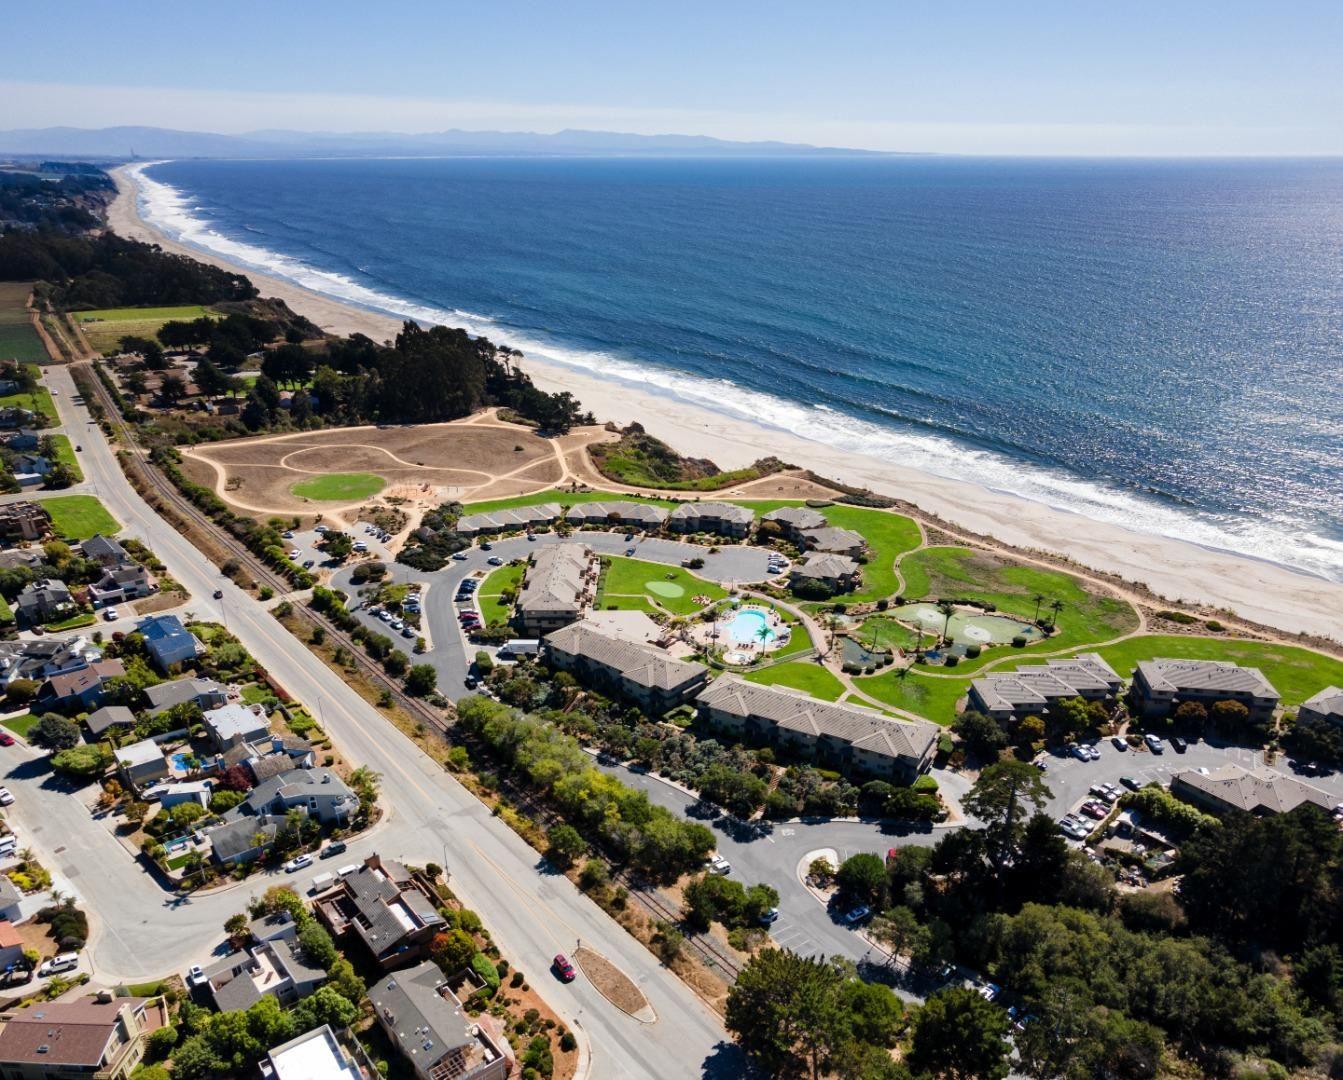 Photo for 416 Seascape Resort Drive, APTOS, CA 95003 (MLS # ML81864218)